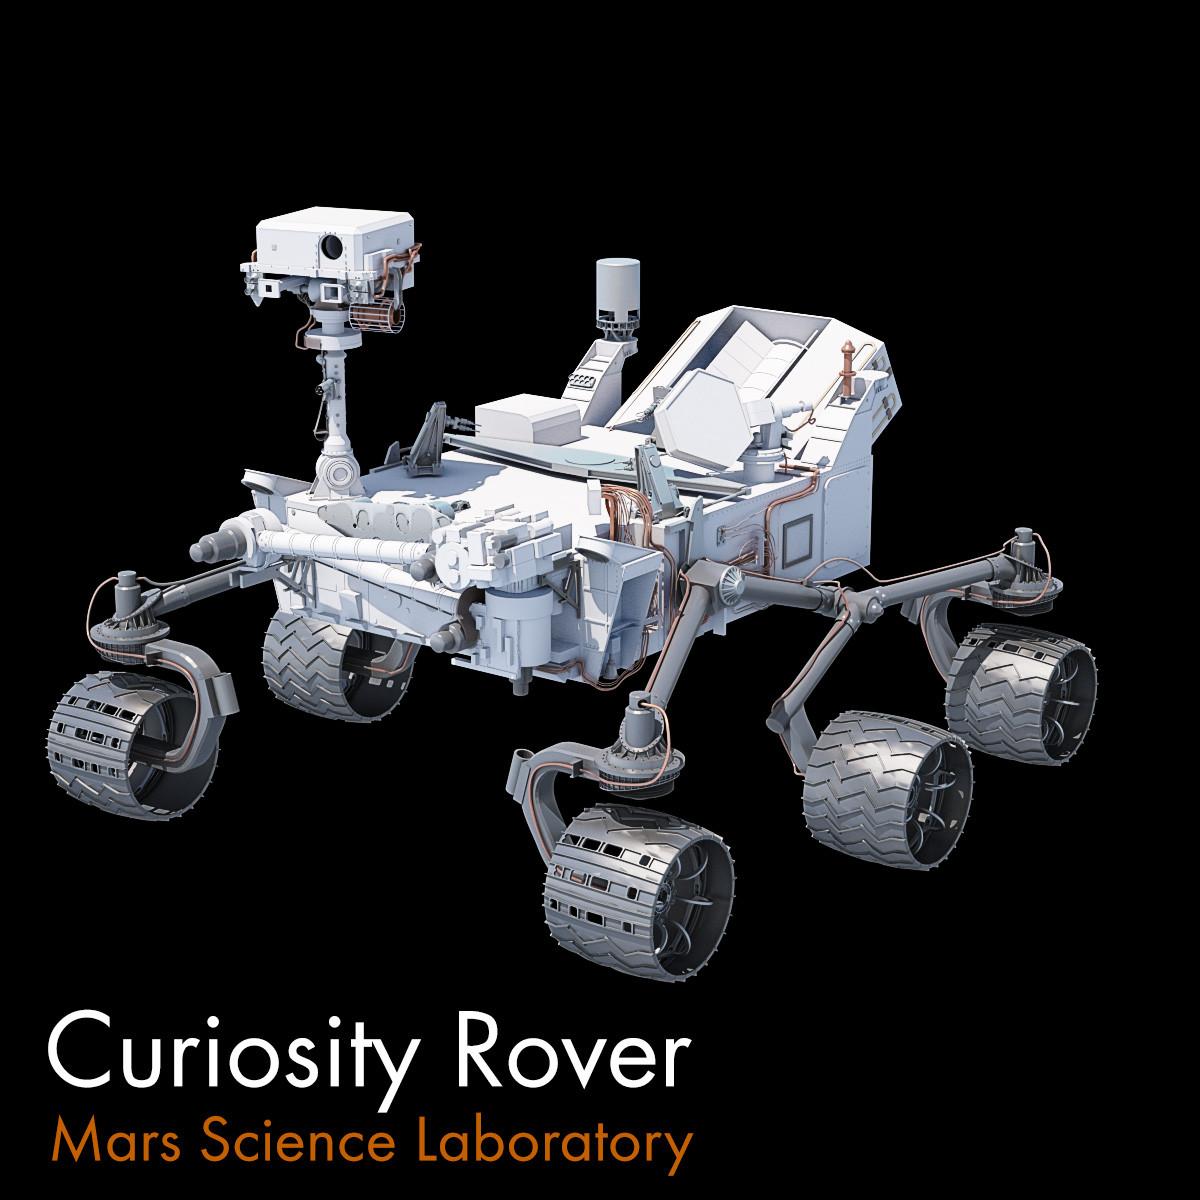 rover_main.jpg